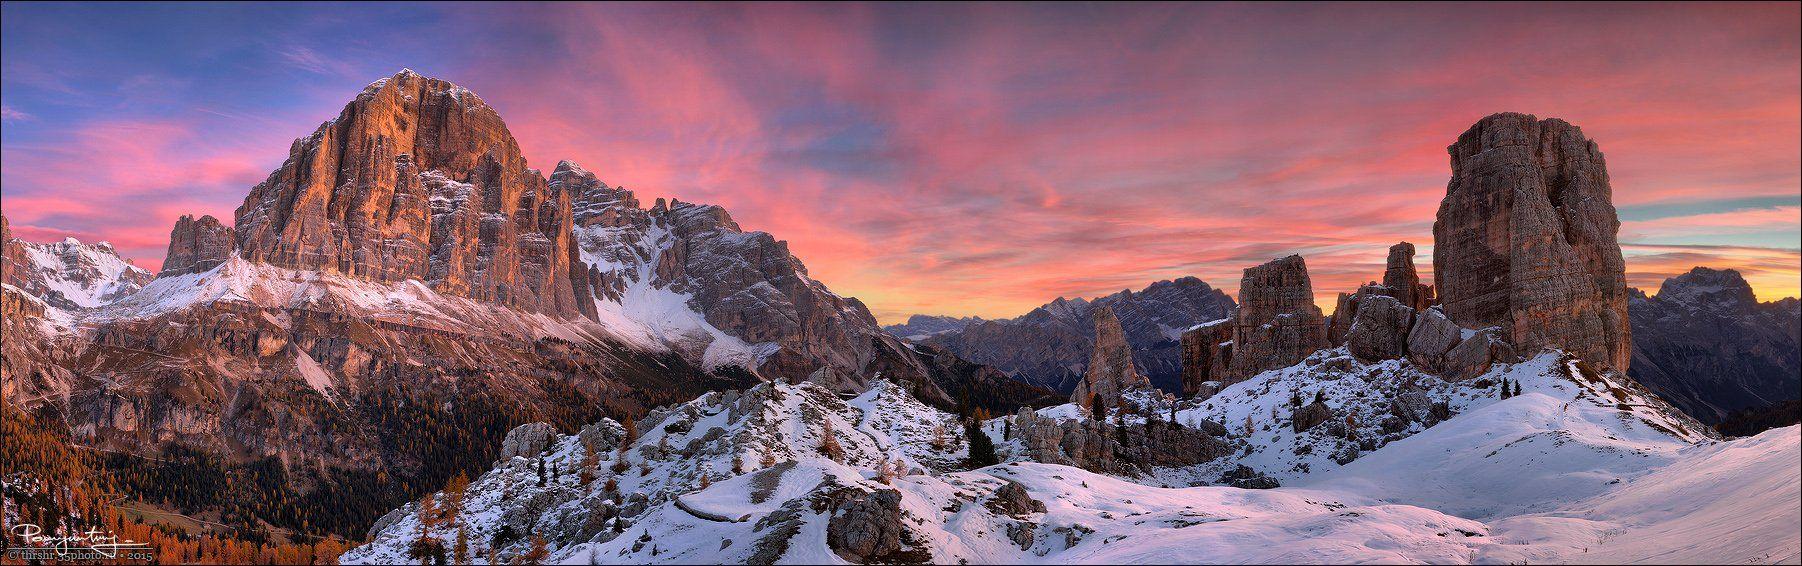 Alps, Bolzano, Cinque torri, Dawn, Dolomites, Hdr, Italy, Panorama, Snow, South tyrol, Sunrise, Andrew Thrasher